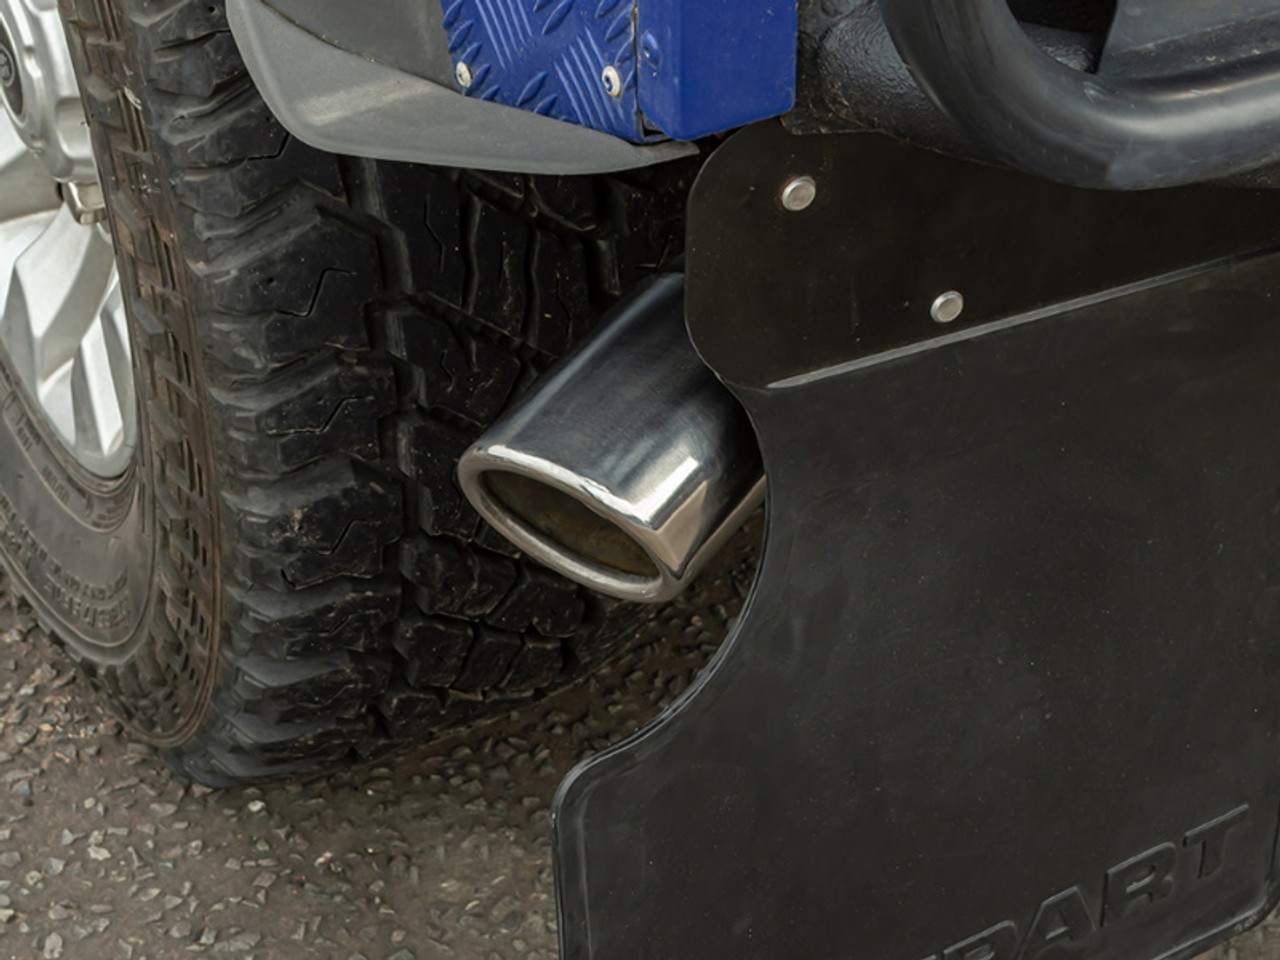 Terrafirma Defender 110 TD5/TDCI Big Bore 3 inch  Straight Through Tailpipe - DA2779